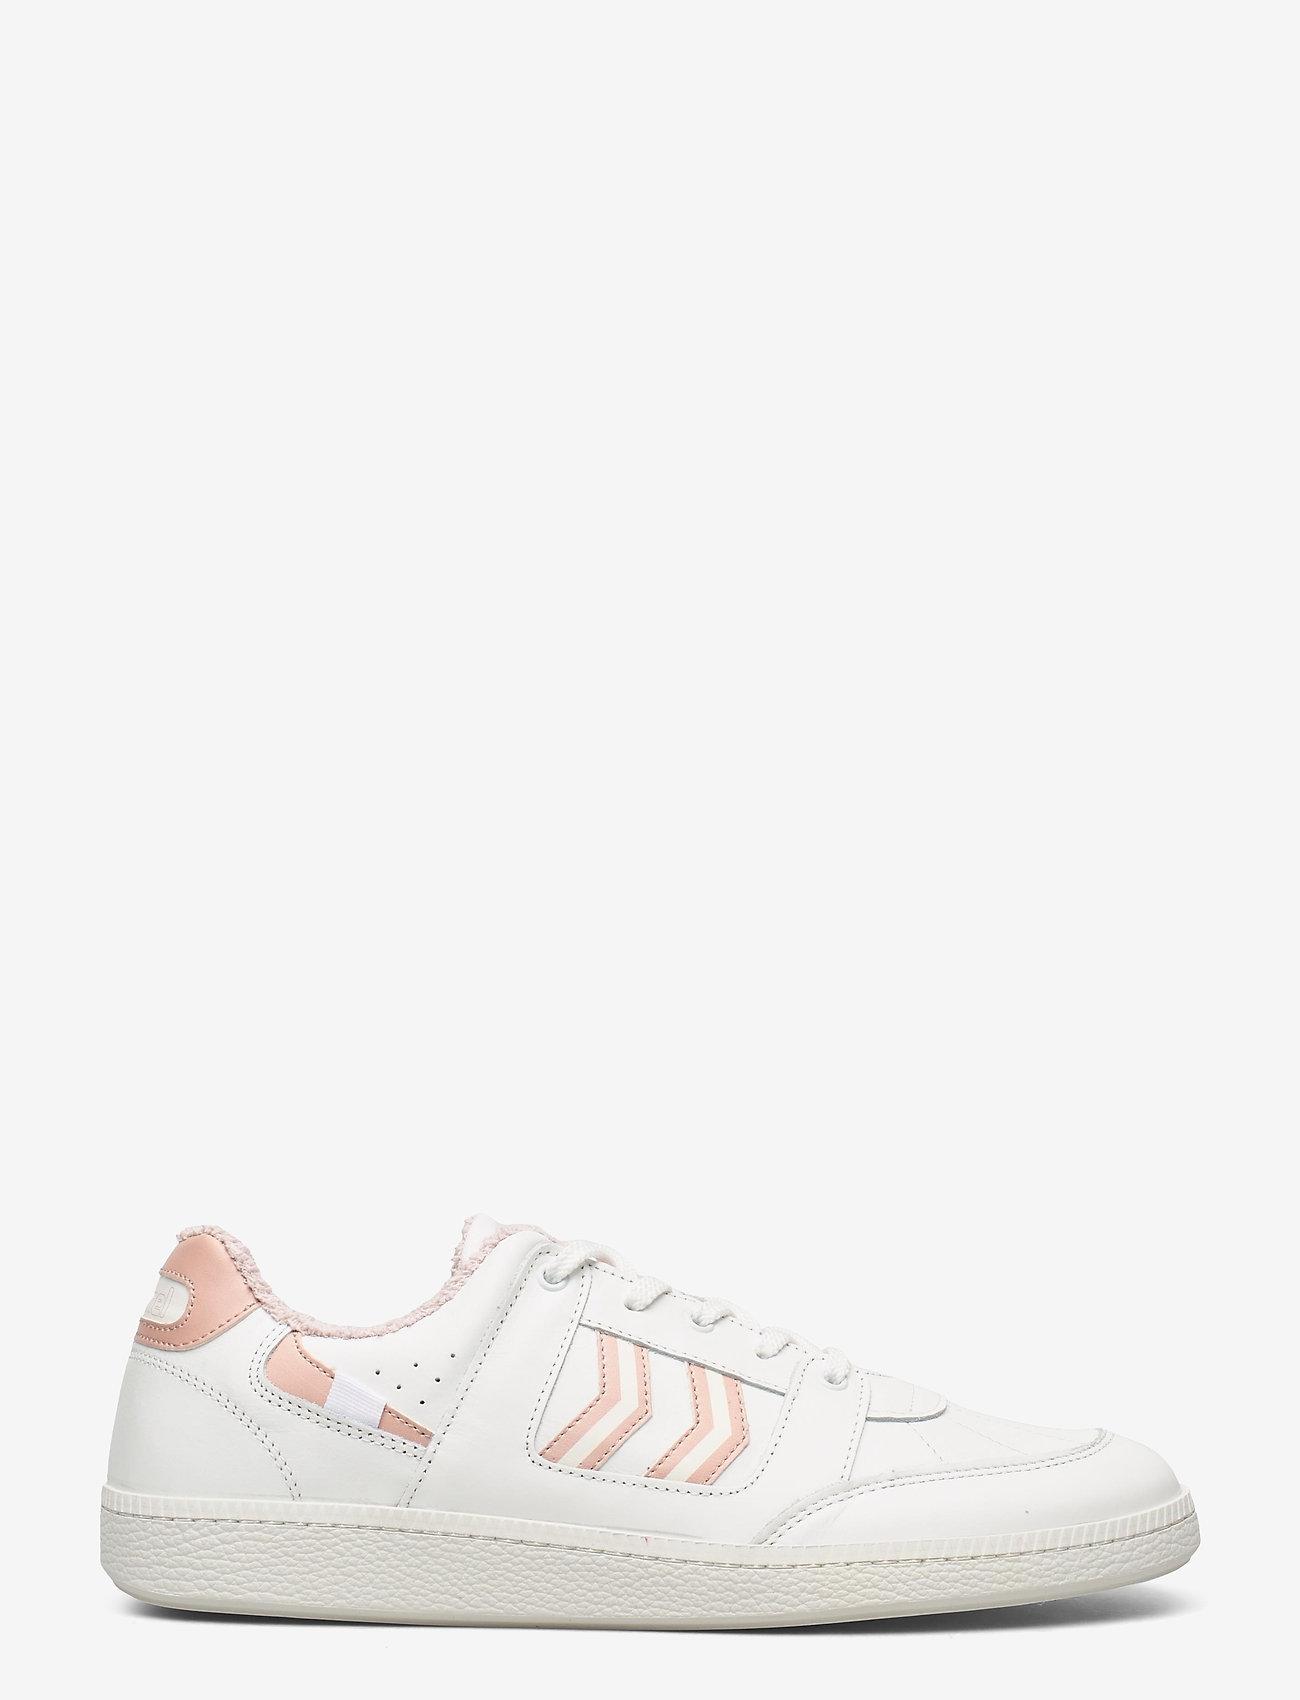 Hummel - SEOUL - laag sneakers - white - 0